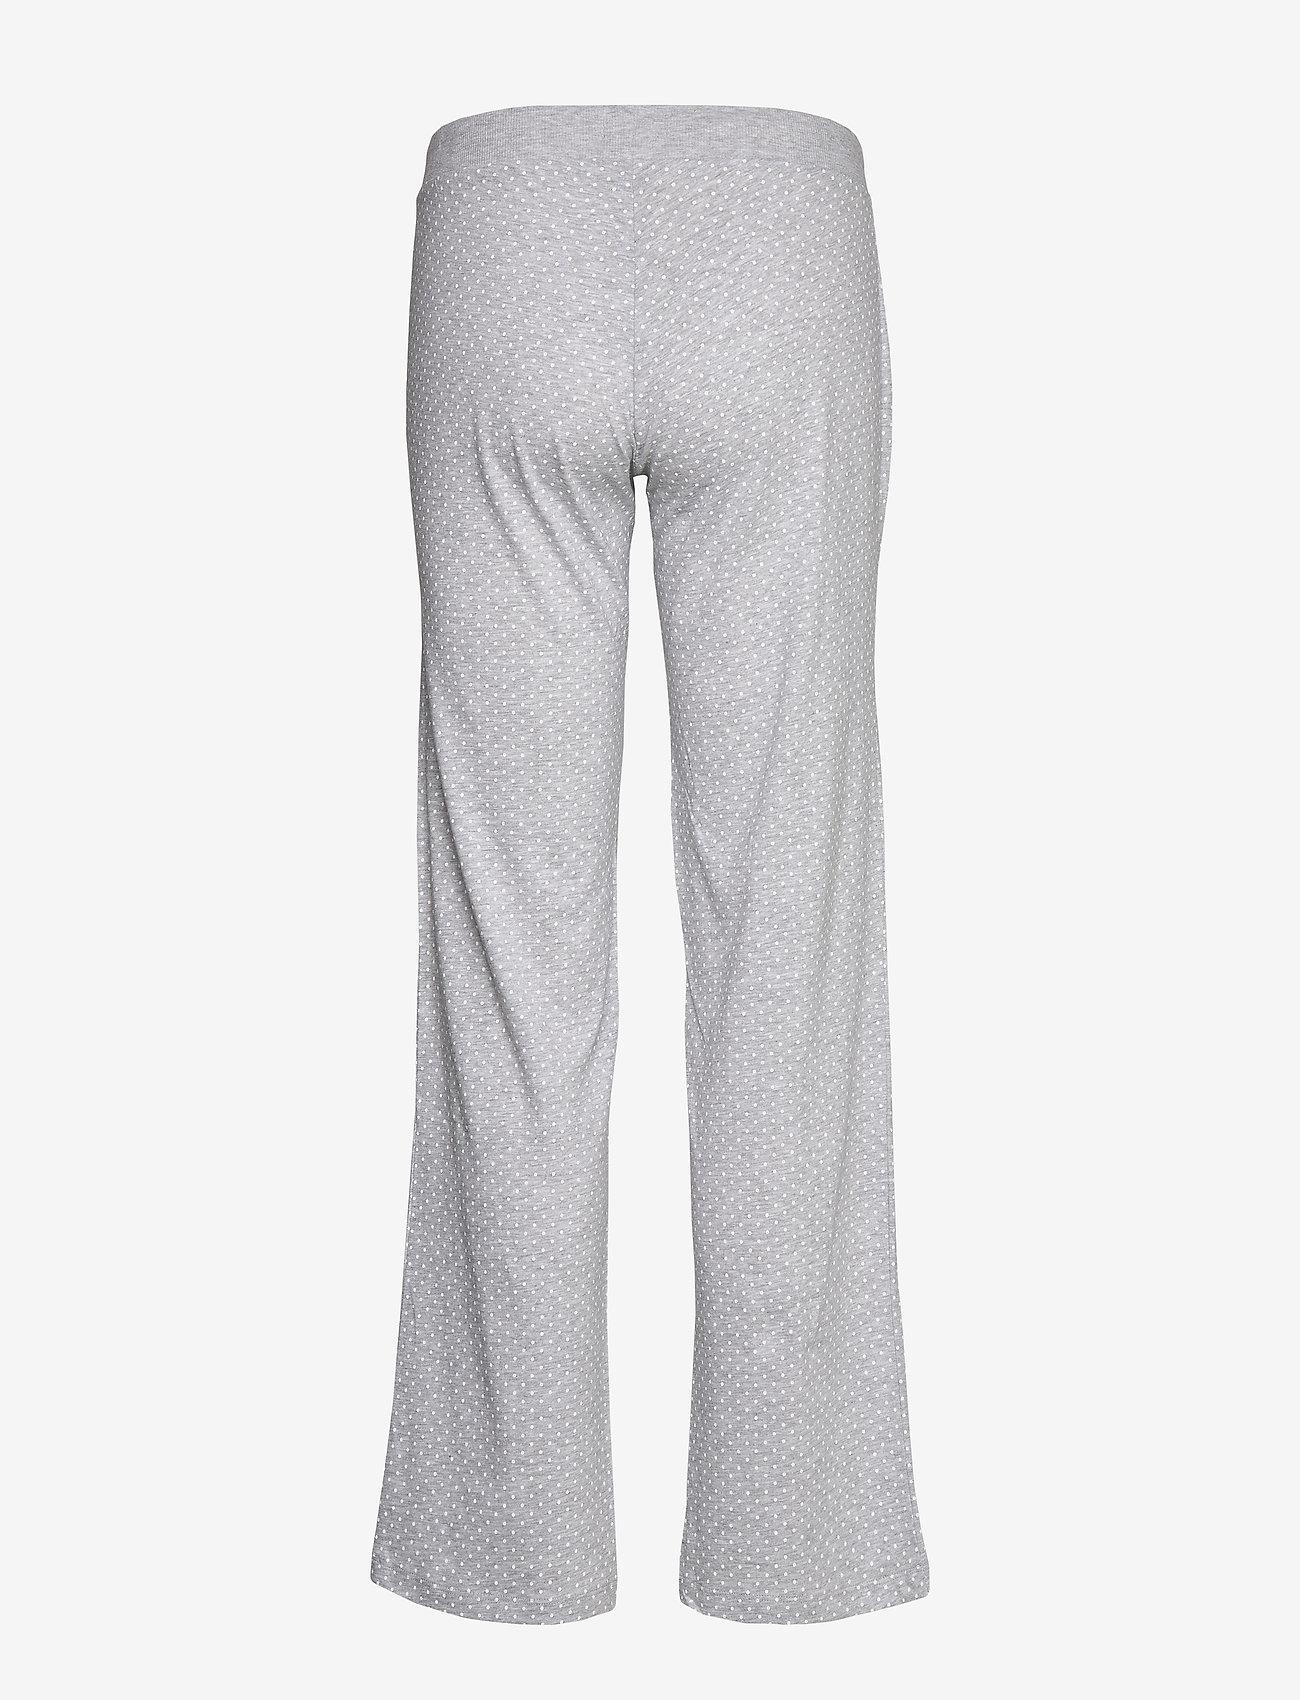 Esprit Bodywear Women - Nightpants - doły - light grey - 1